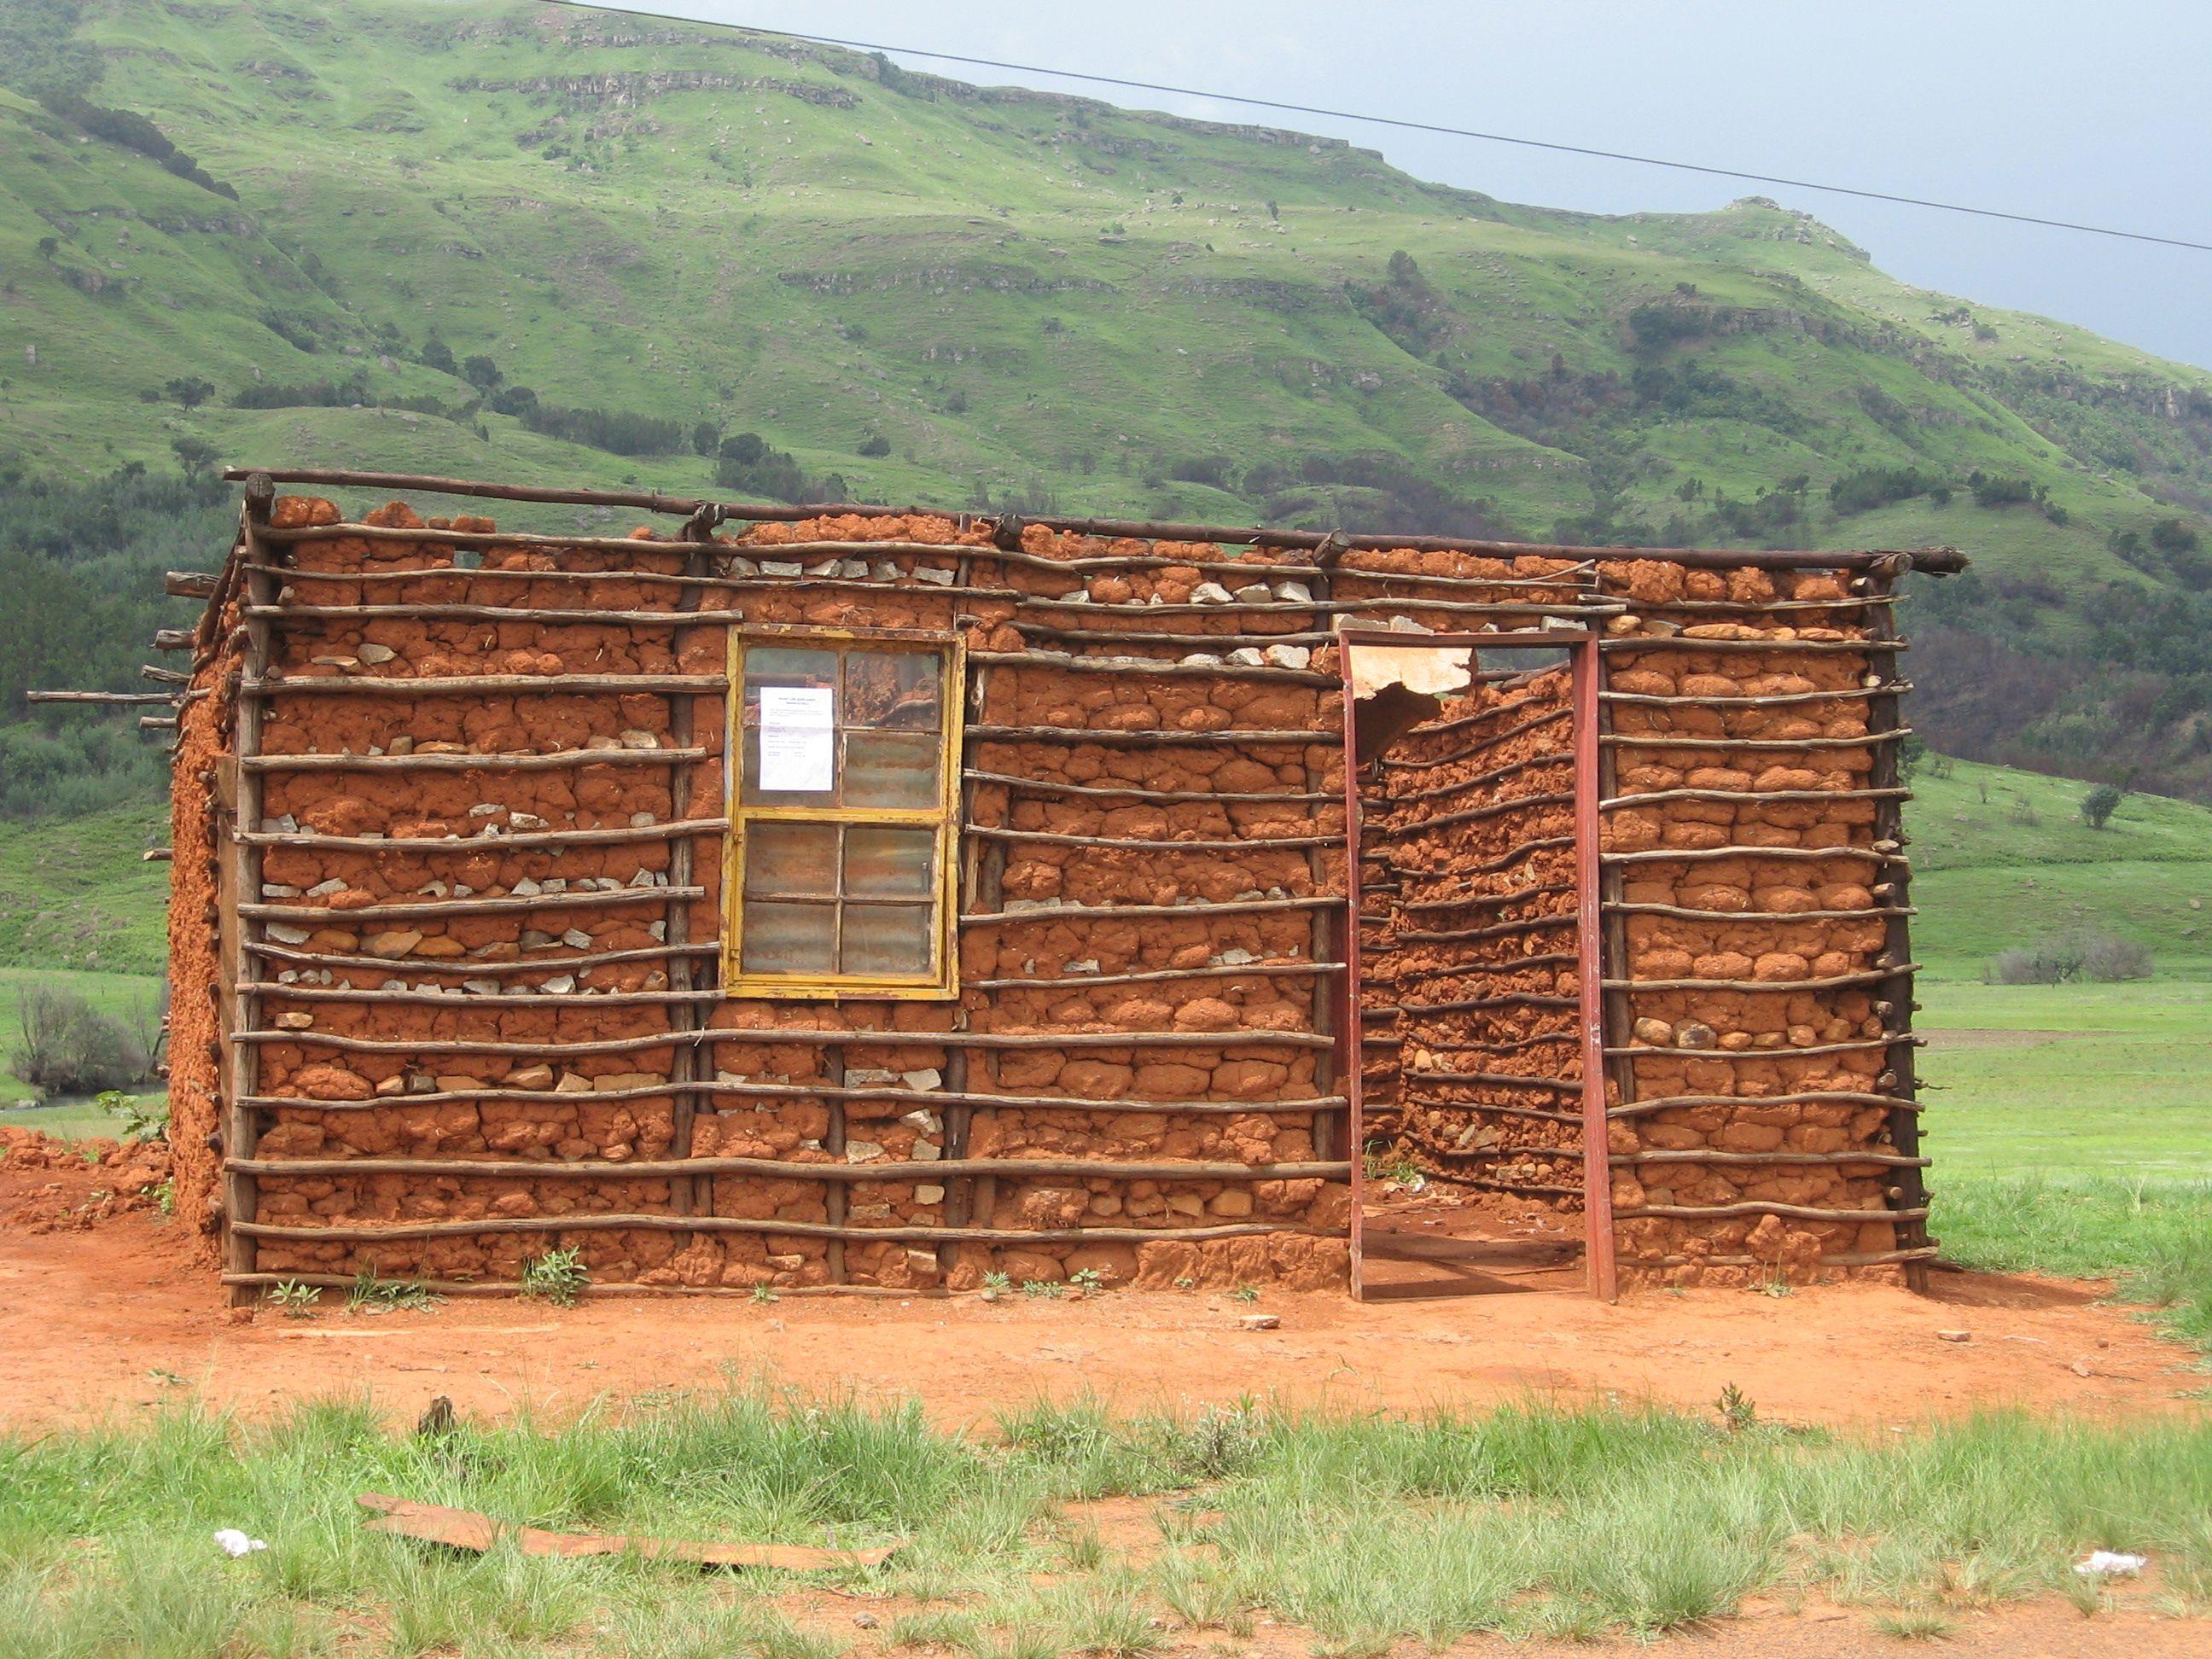 house under construction, rural KwaZuluNatal, South